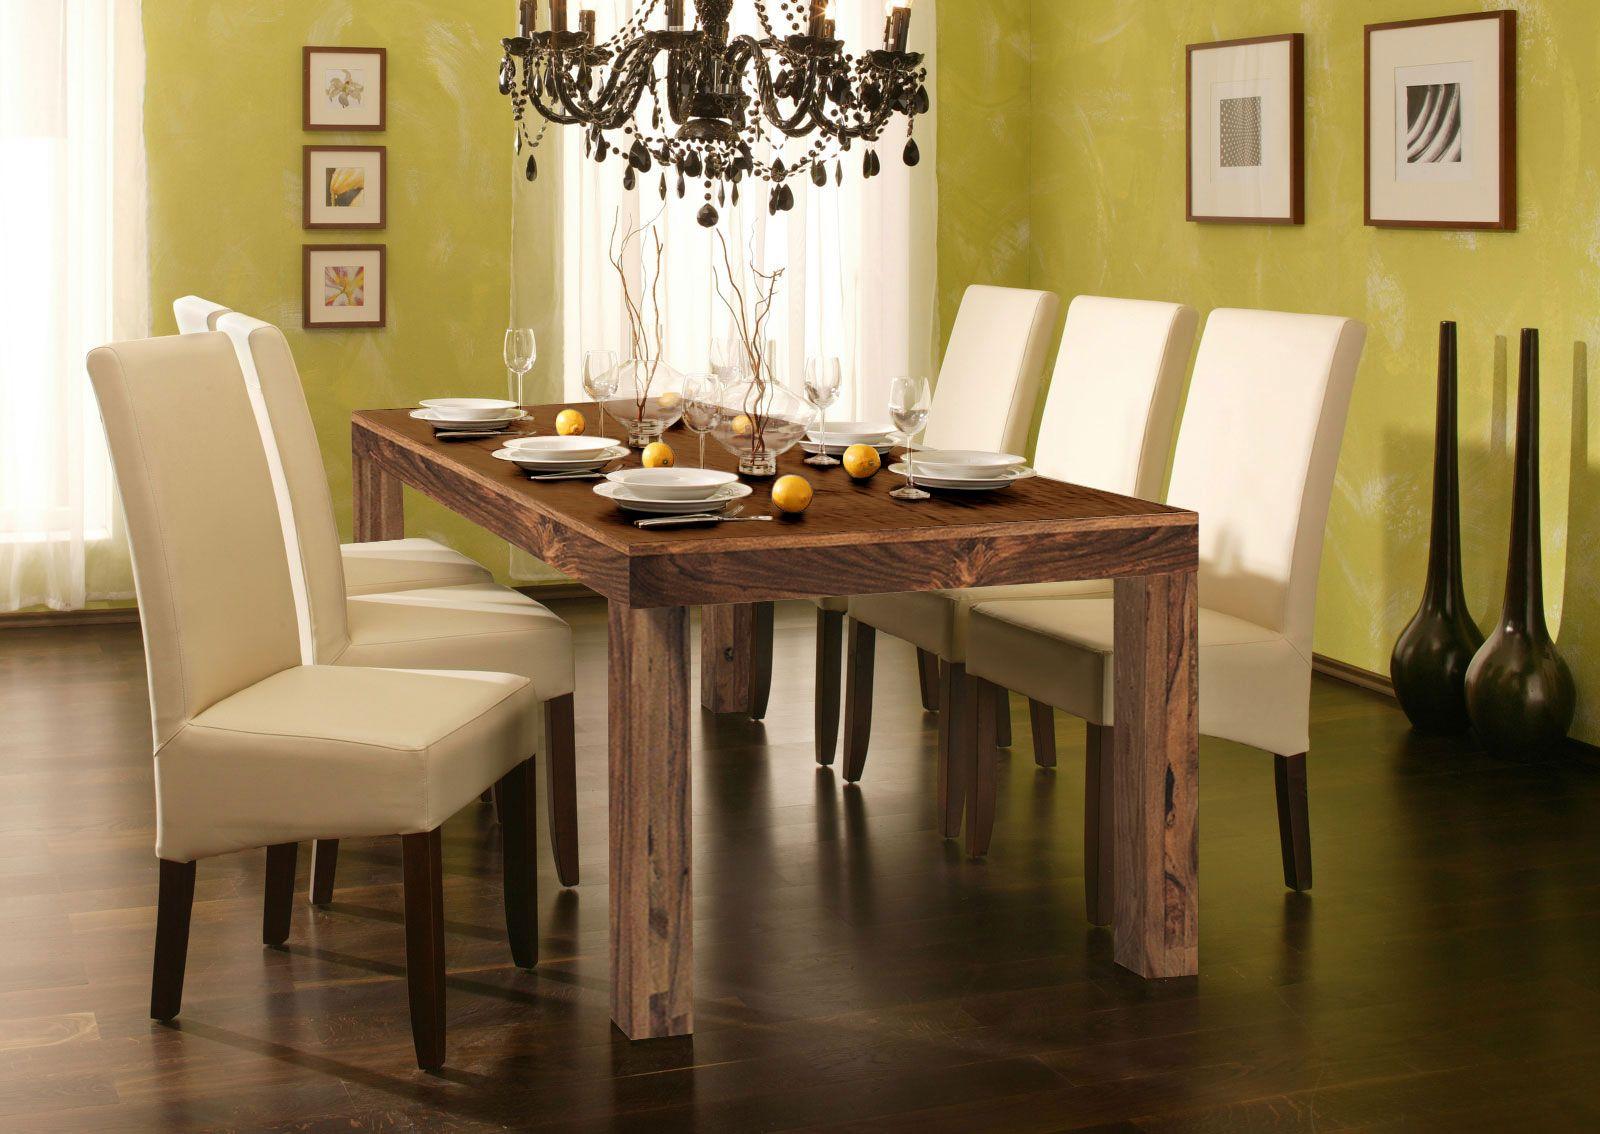 Großartig SAM® Sheesham Esszimmer Tischgruppe Natur 7tlg Creme Cubus 7029